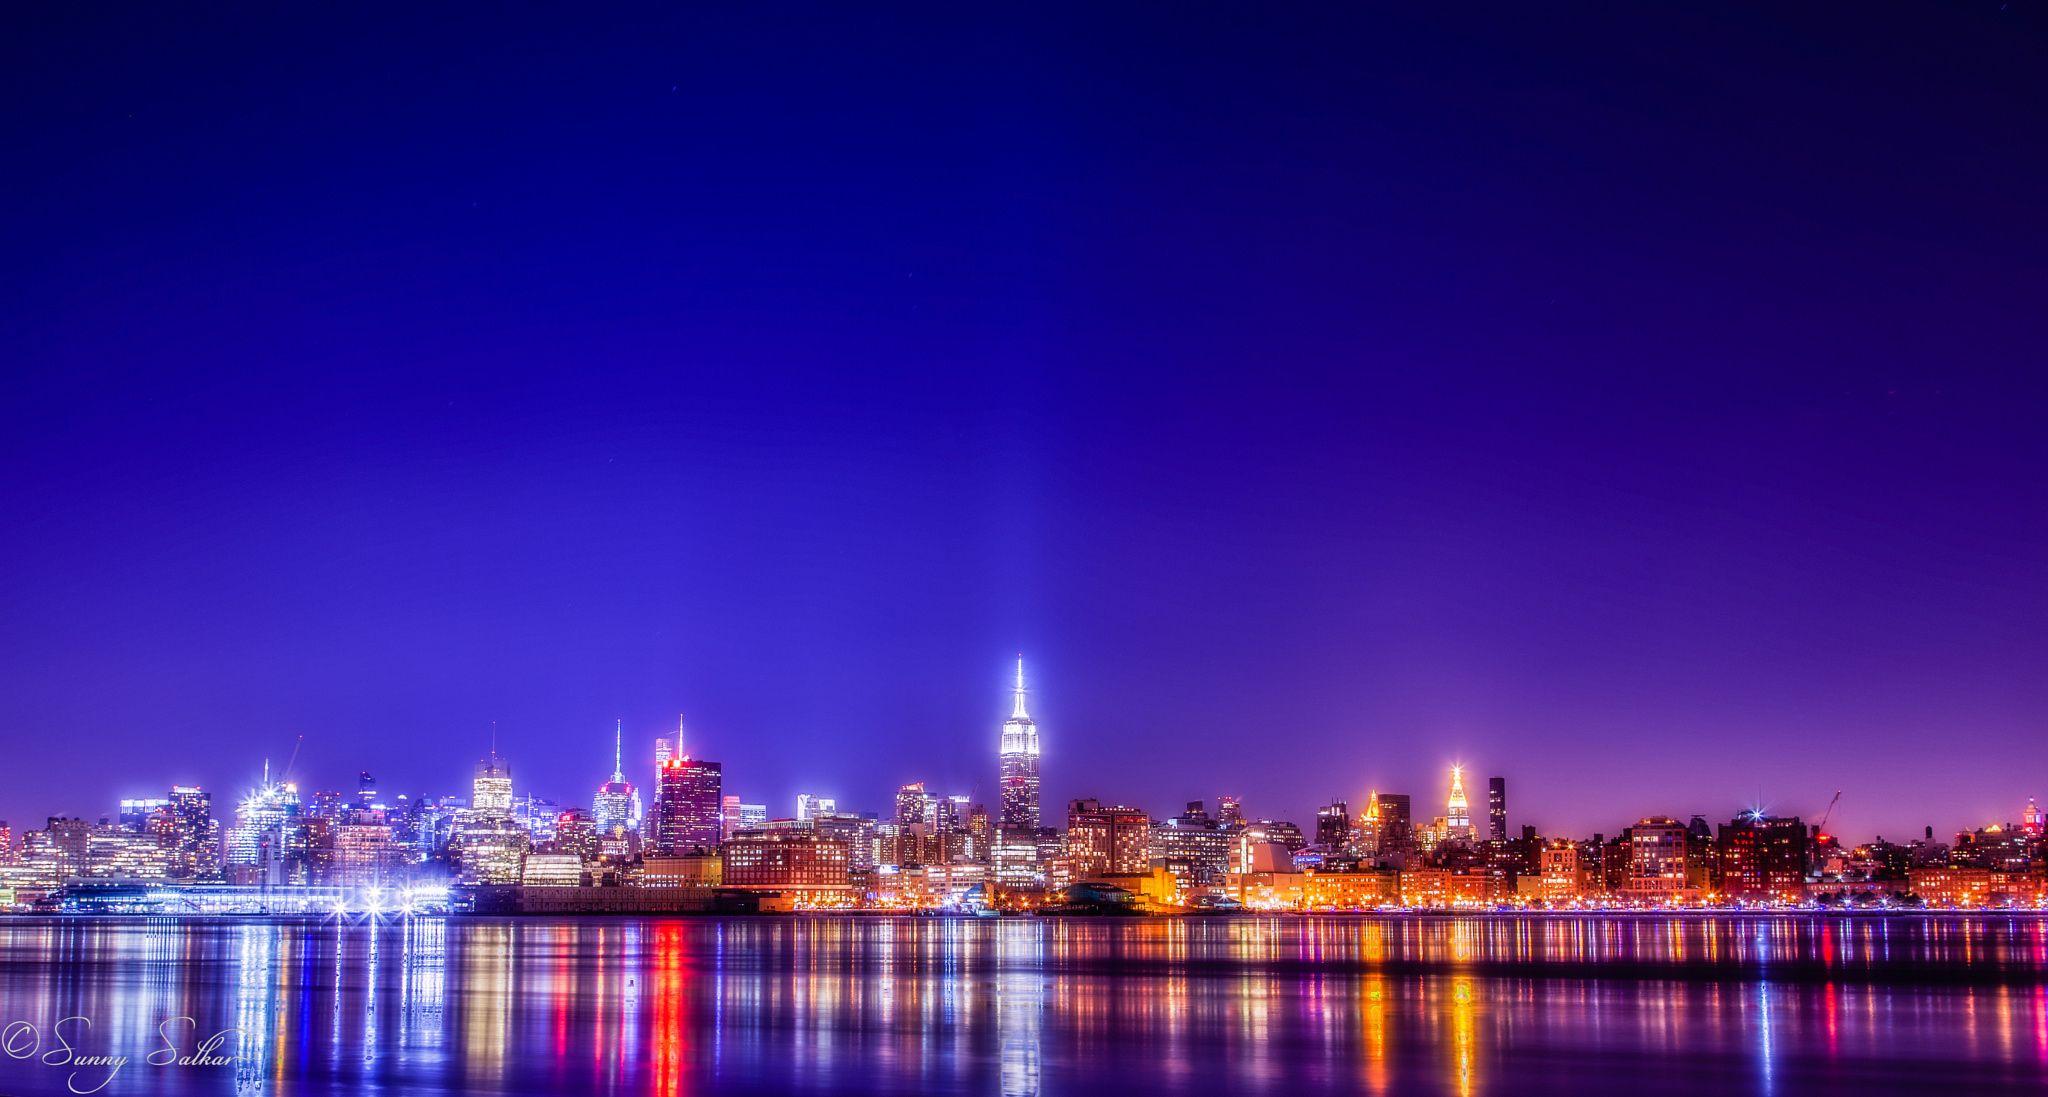 CITY OF BLINDING LIGHTS by Sunny Salkar on 500px